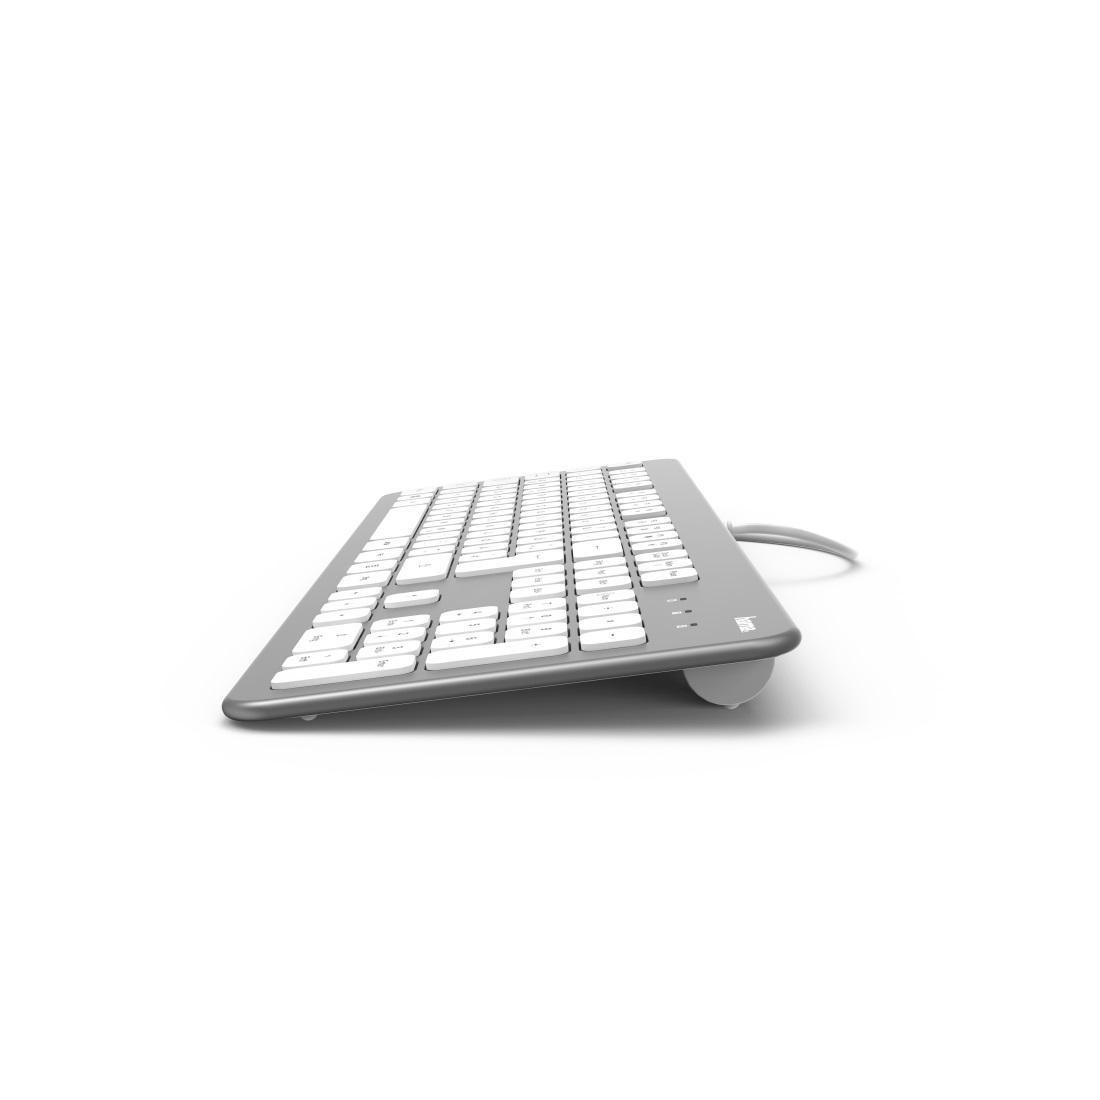 Клавиатура безшумна HAMA KC-700, с кабел, USB, кирилизирана, Сребрист/Бял-3